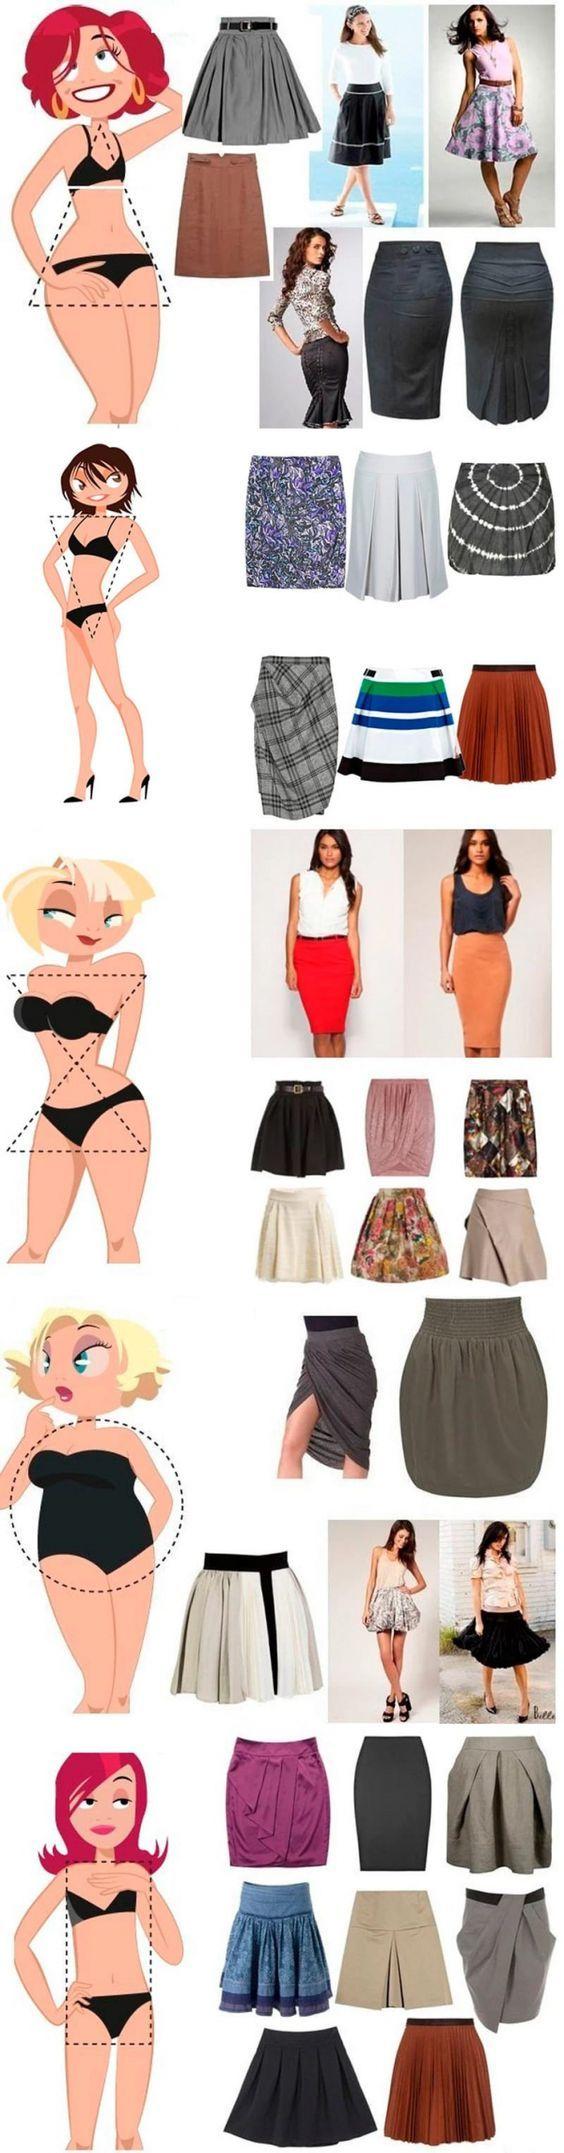 How to select skirt